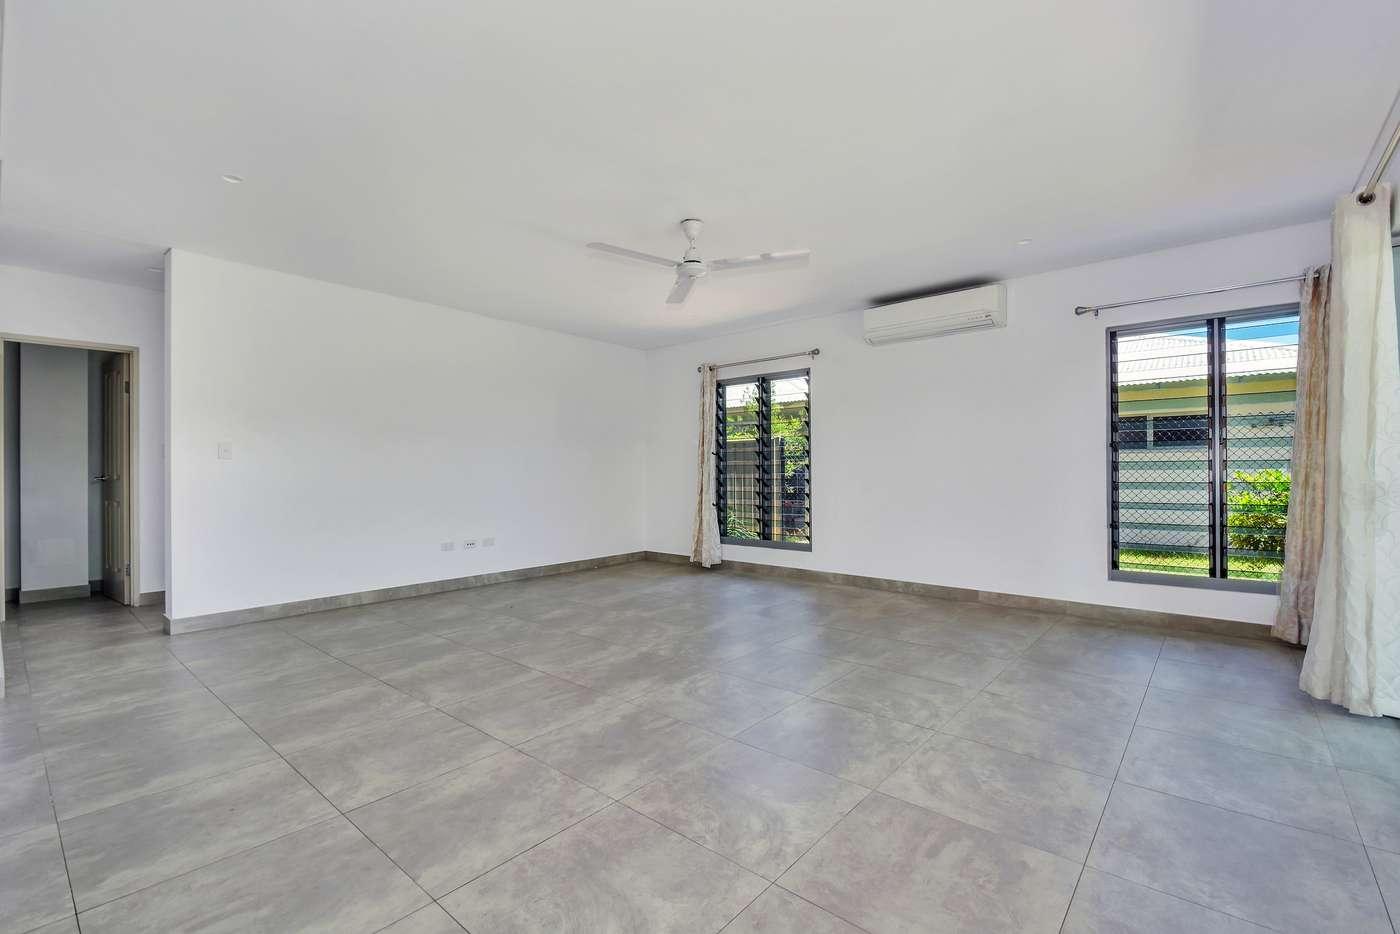 Seventh view of Homely house listing, 2/1 Barratt Street, Muirhead NT 810